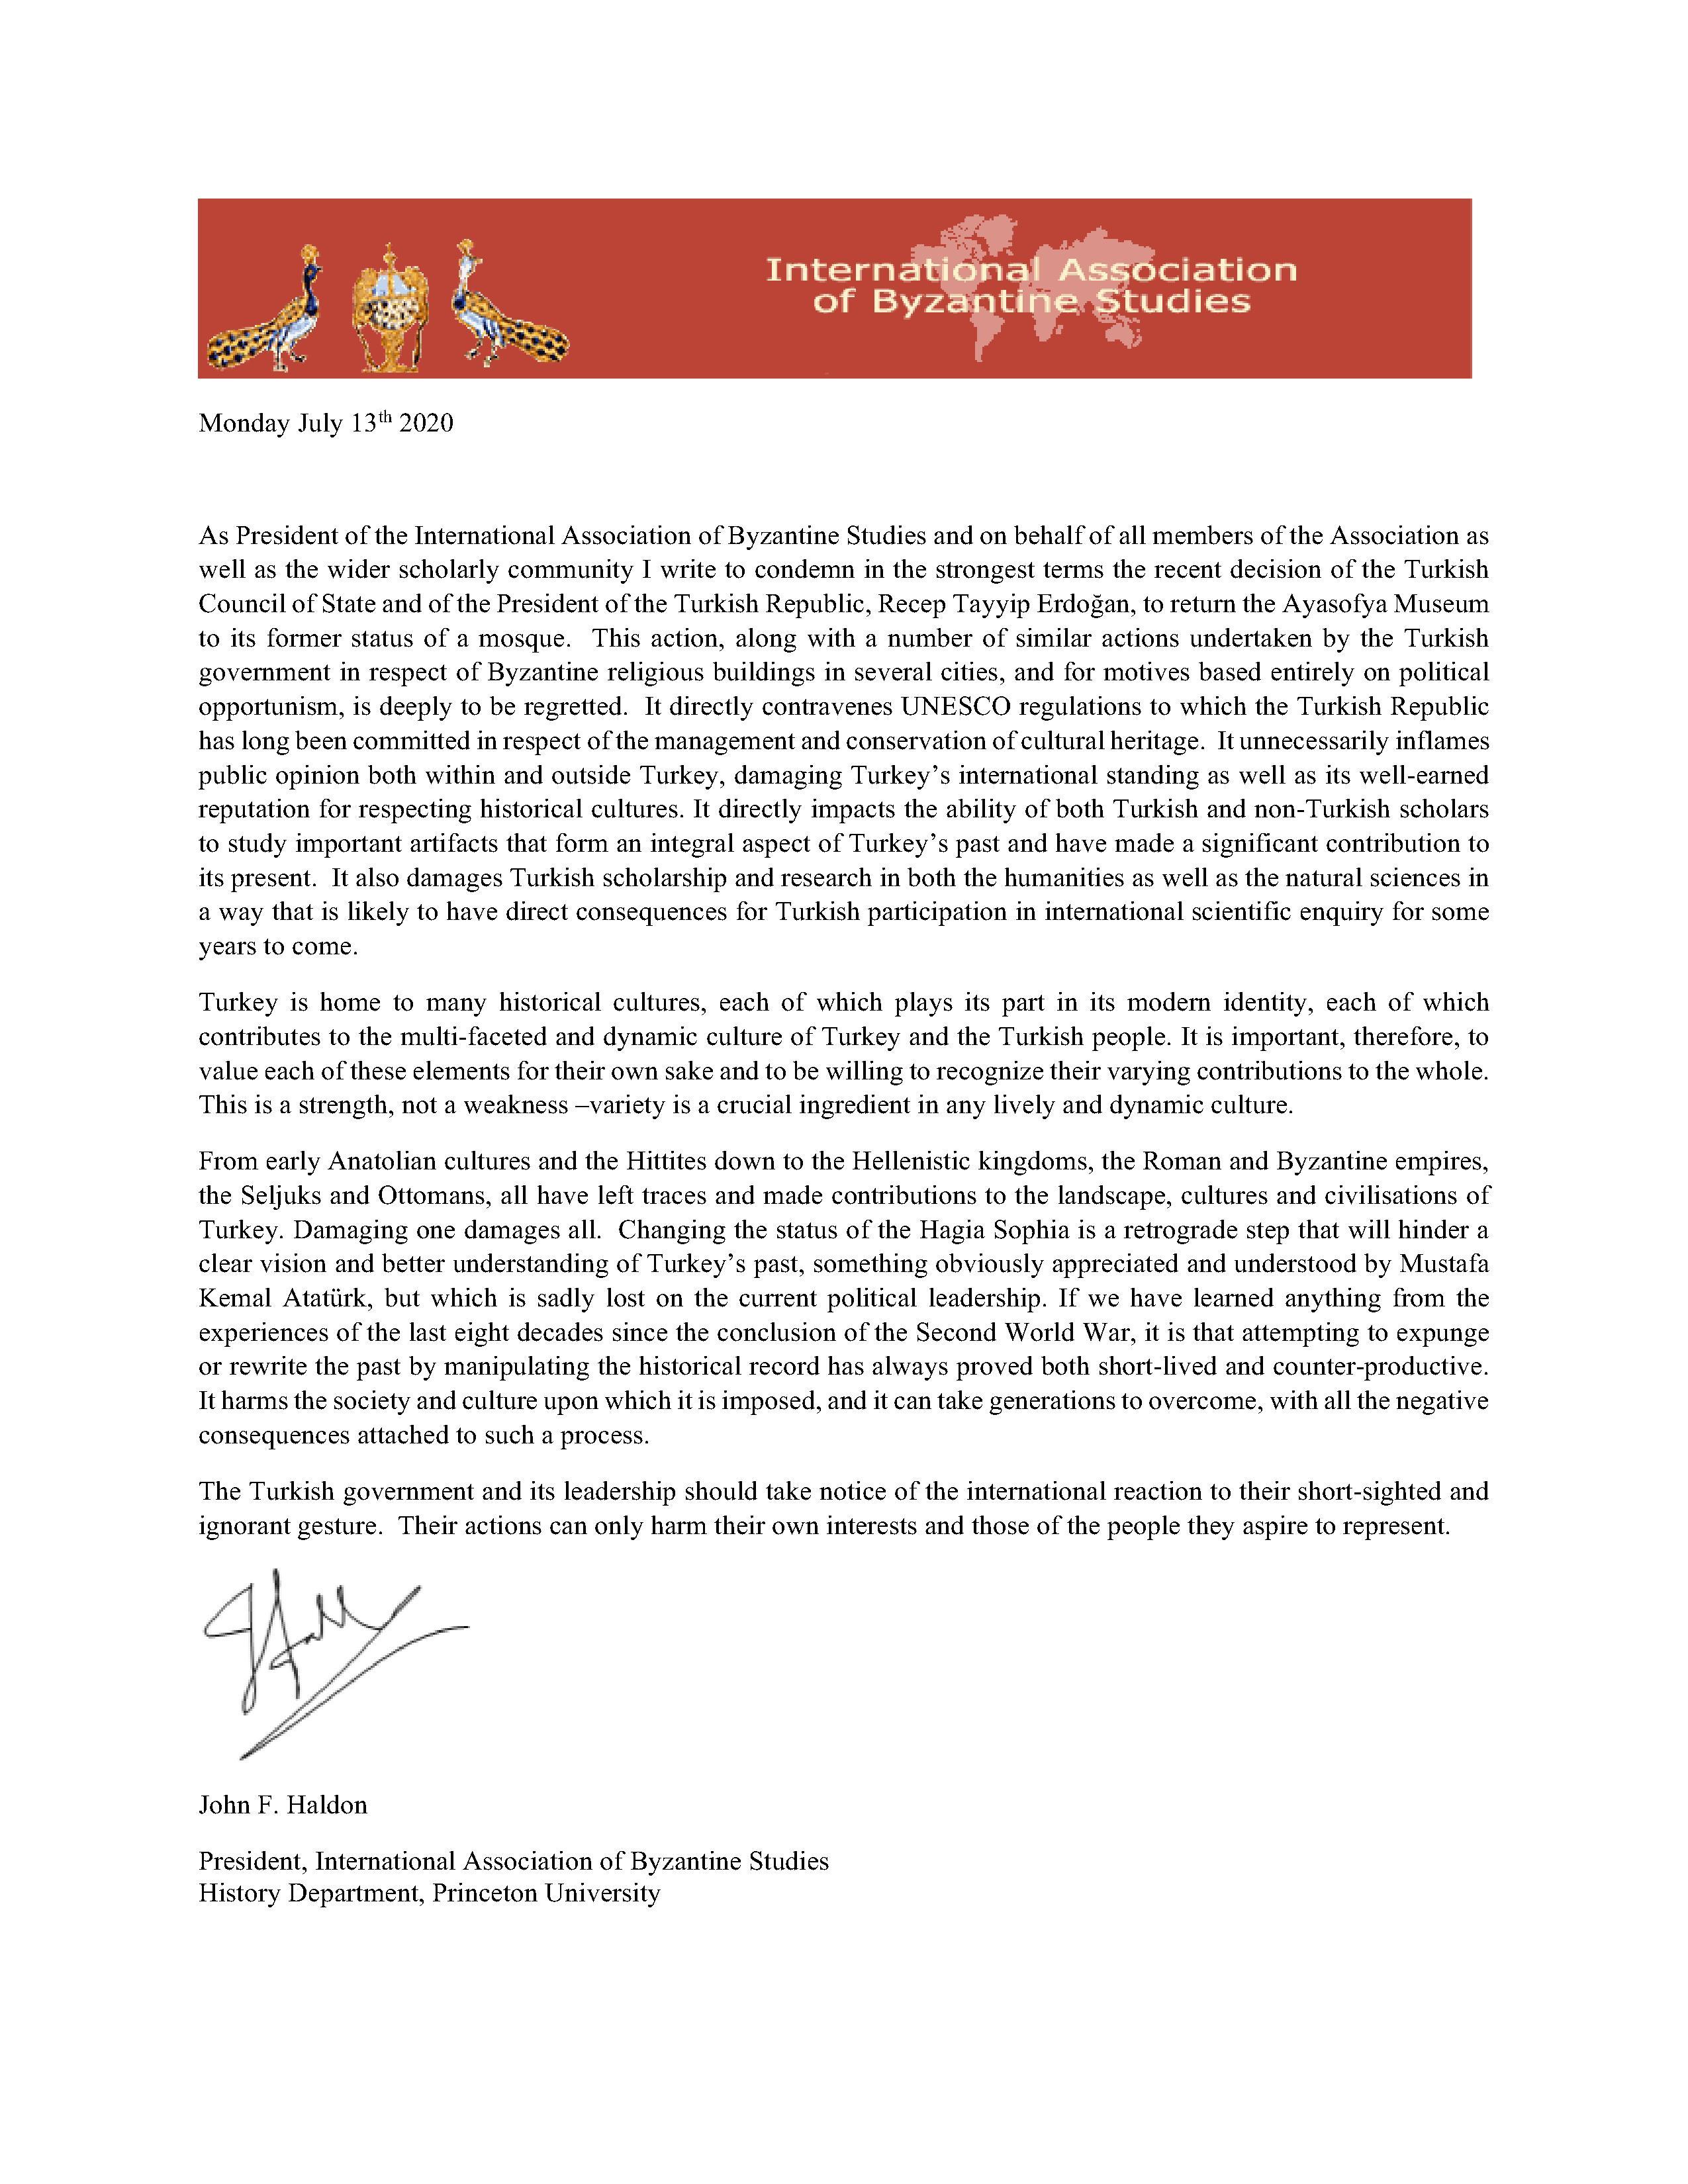 open letter re hagia sophia